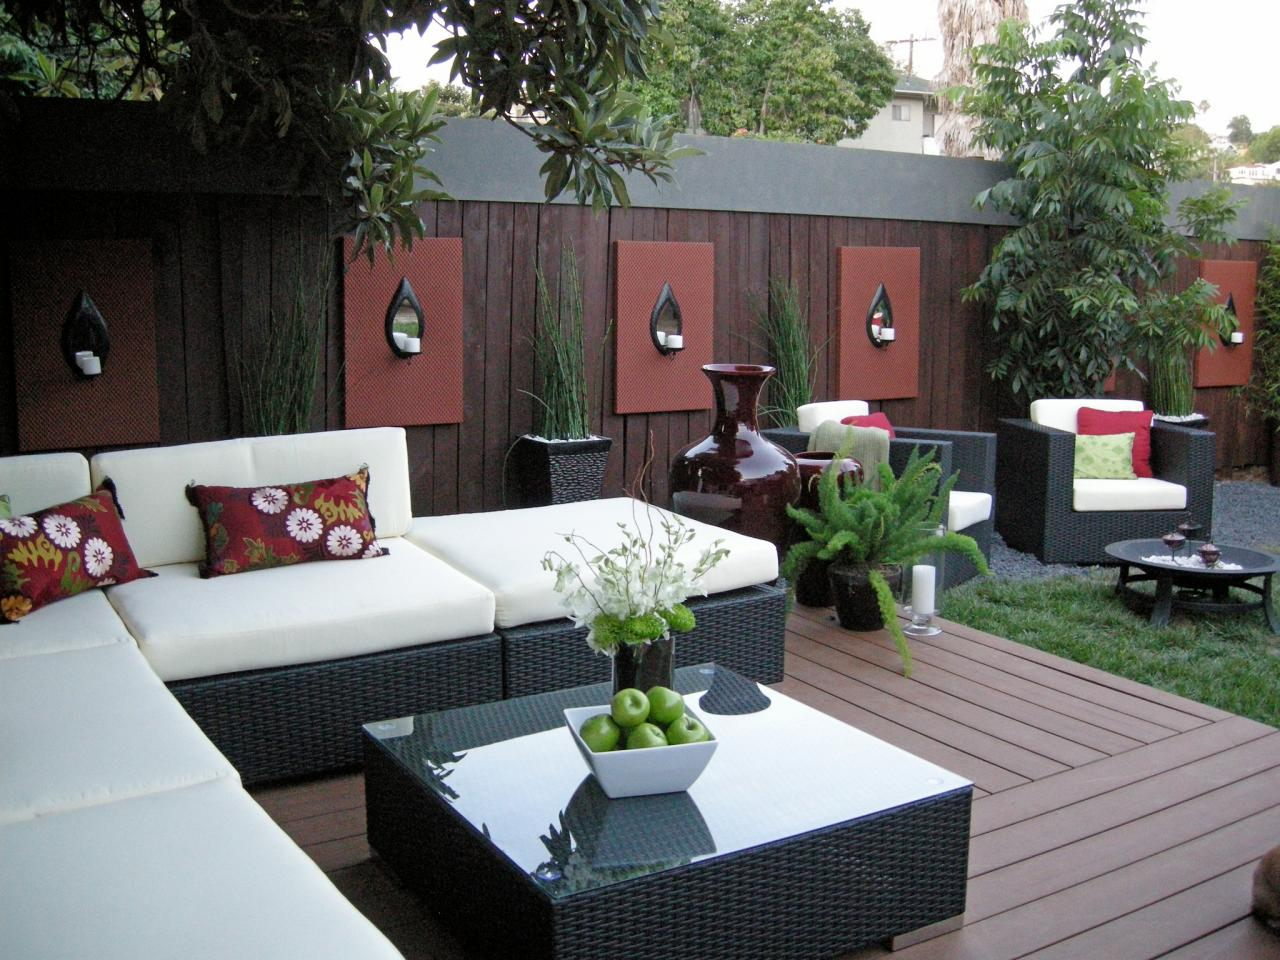 Most Stunning Courtyard Interior Wall Decorating Ideas ... on Backyard Wall Decor Ideas id=32549